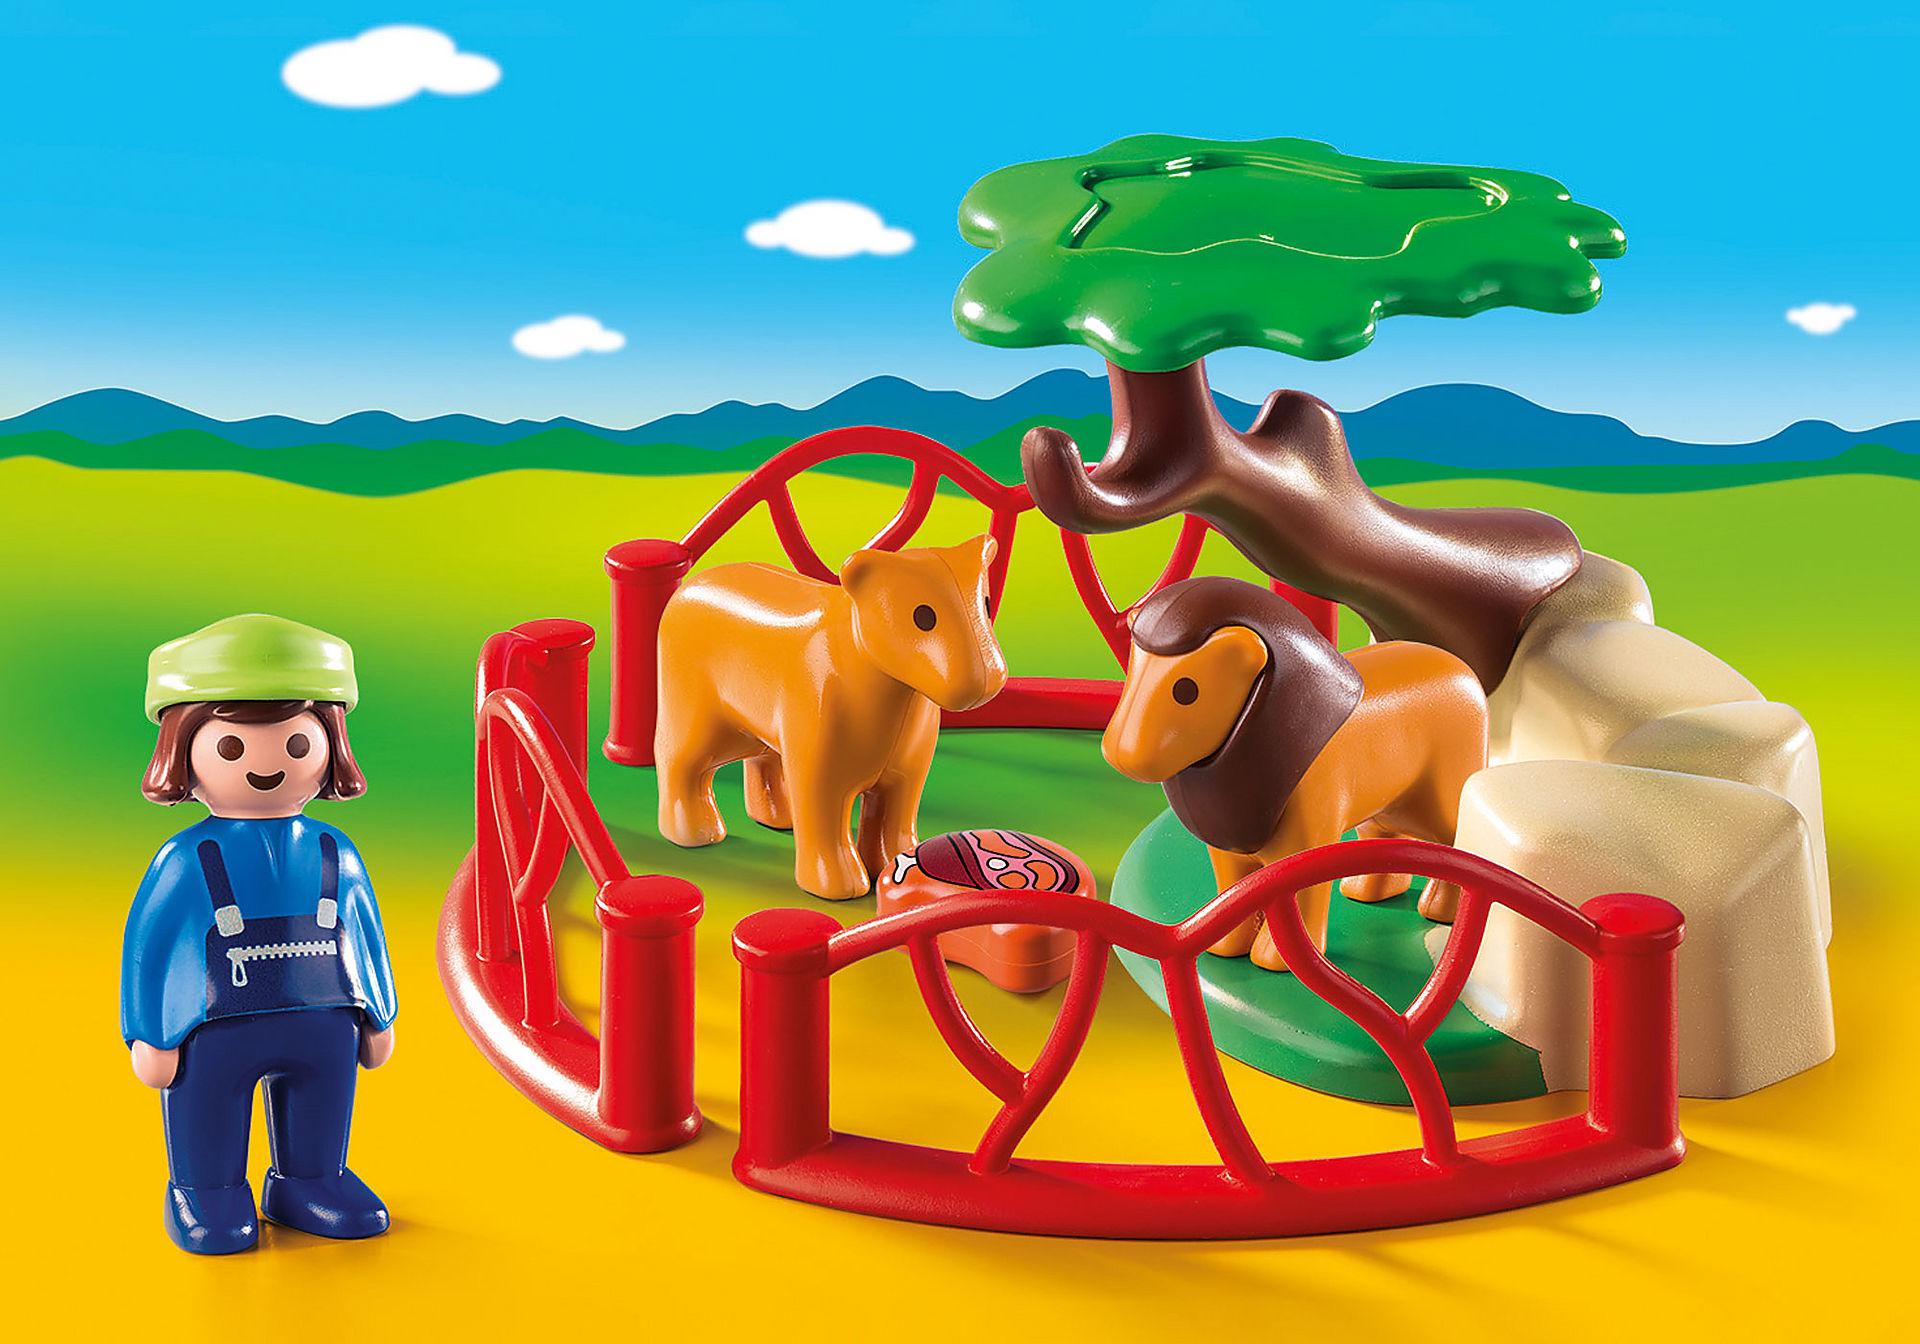 http://media.playmobil.com/i/playmobil/9378_product_detail/Λιοντάρια Ζωολογικού Κήπου με περίφραξη